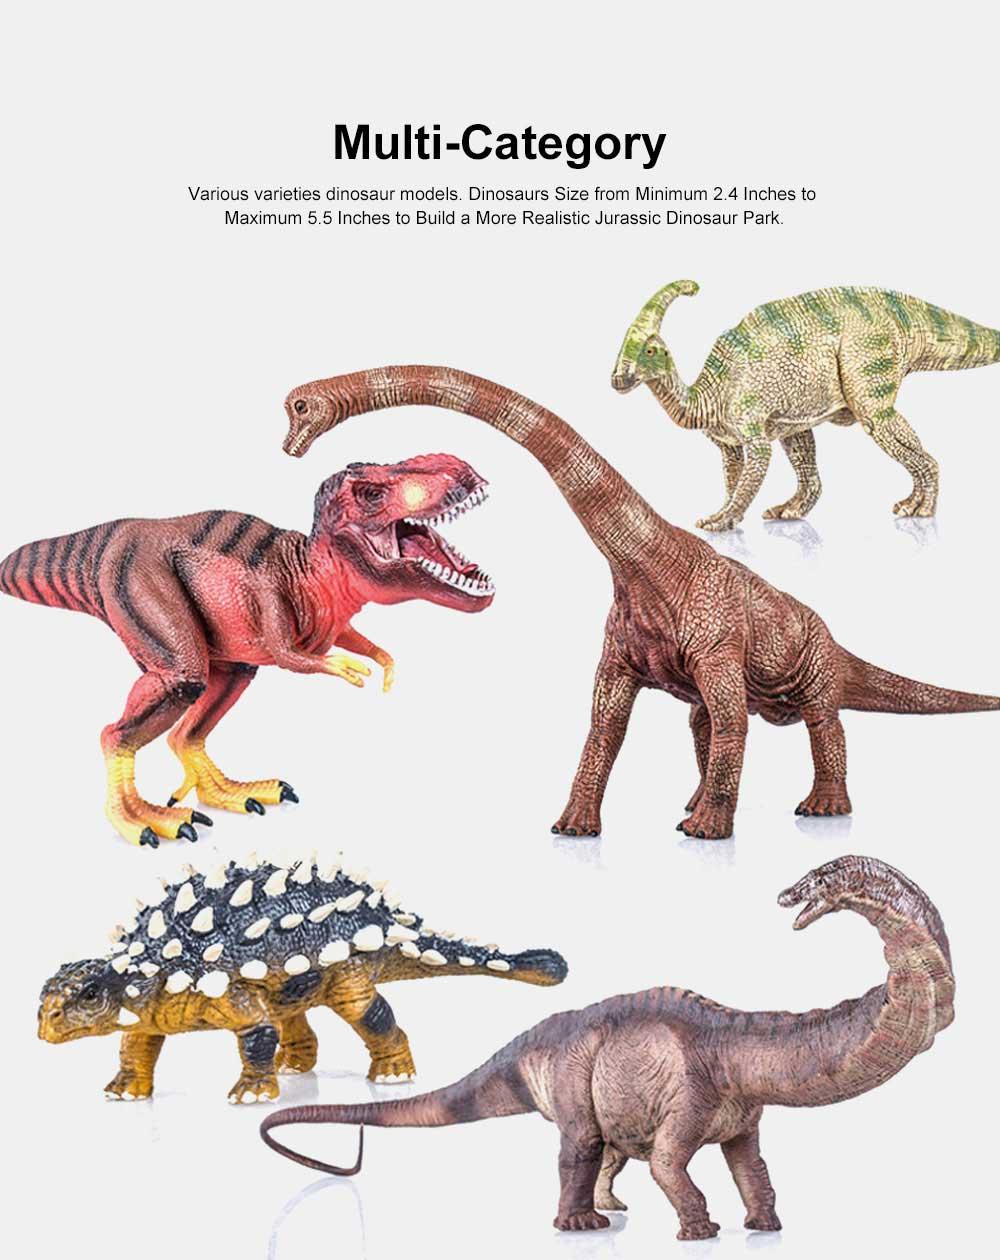 Simulation Halberd Dinosaur Toys, Solid No Stitching PVC Dinosaur Model, Educational Realistic Dinosaur Figures 2